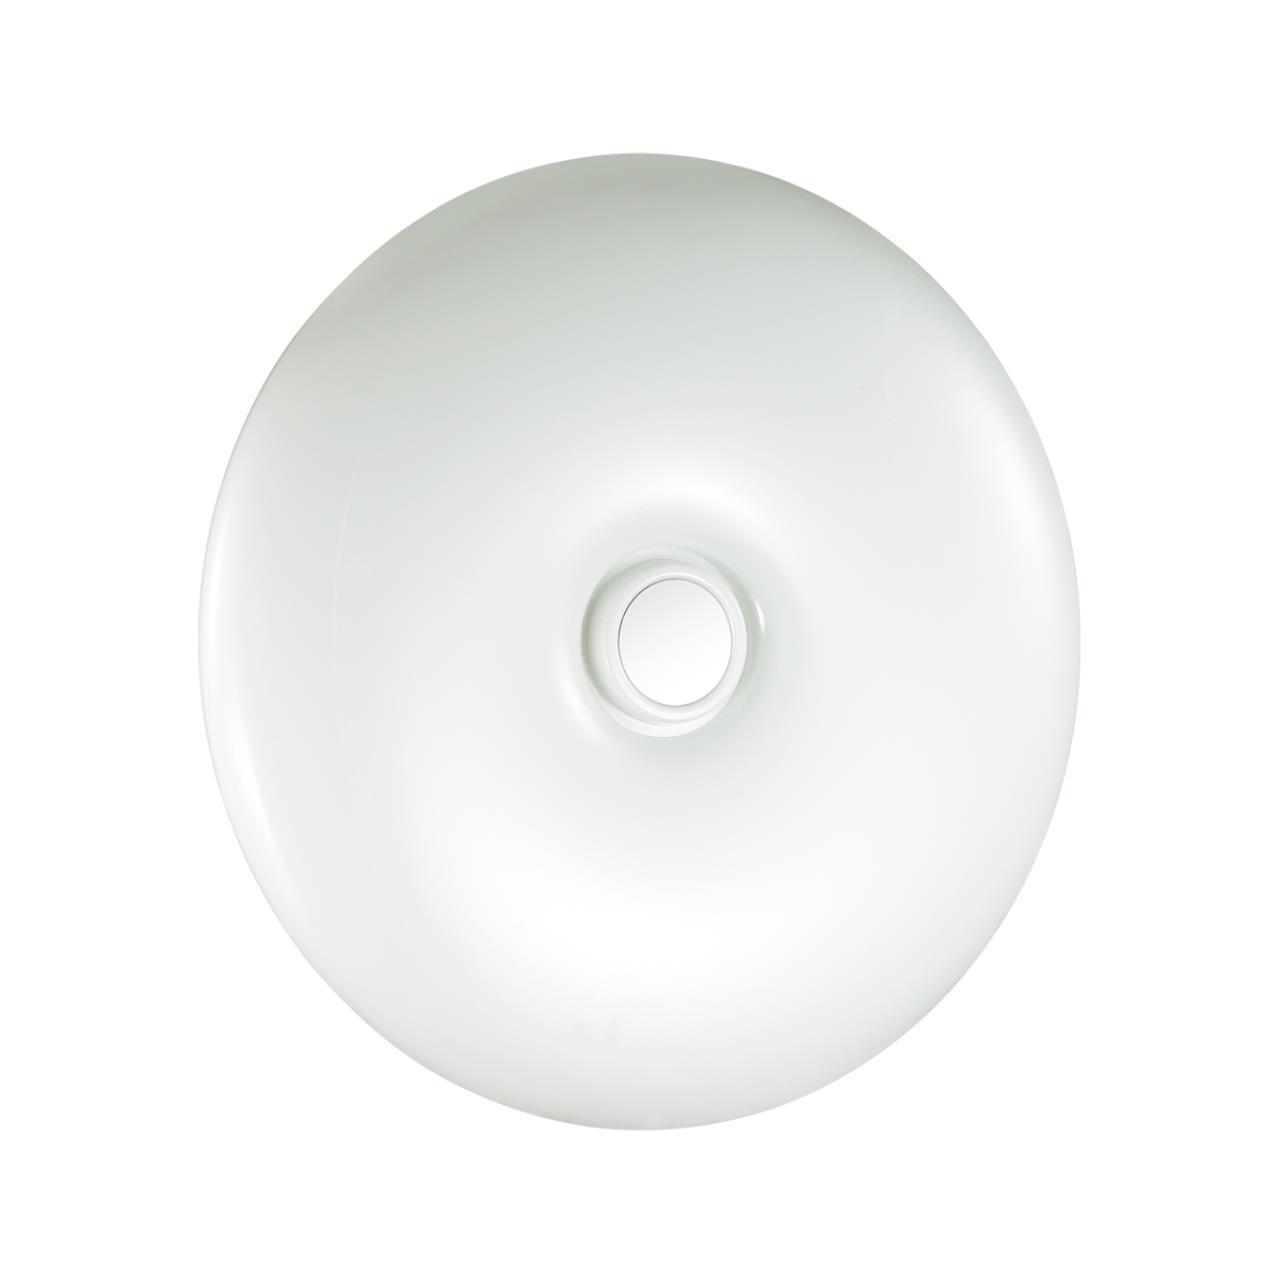 3021/DL SN 024 св-к POINT пластик LED 48Вт 3000-6000K D410 IP43 пульт ДУ